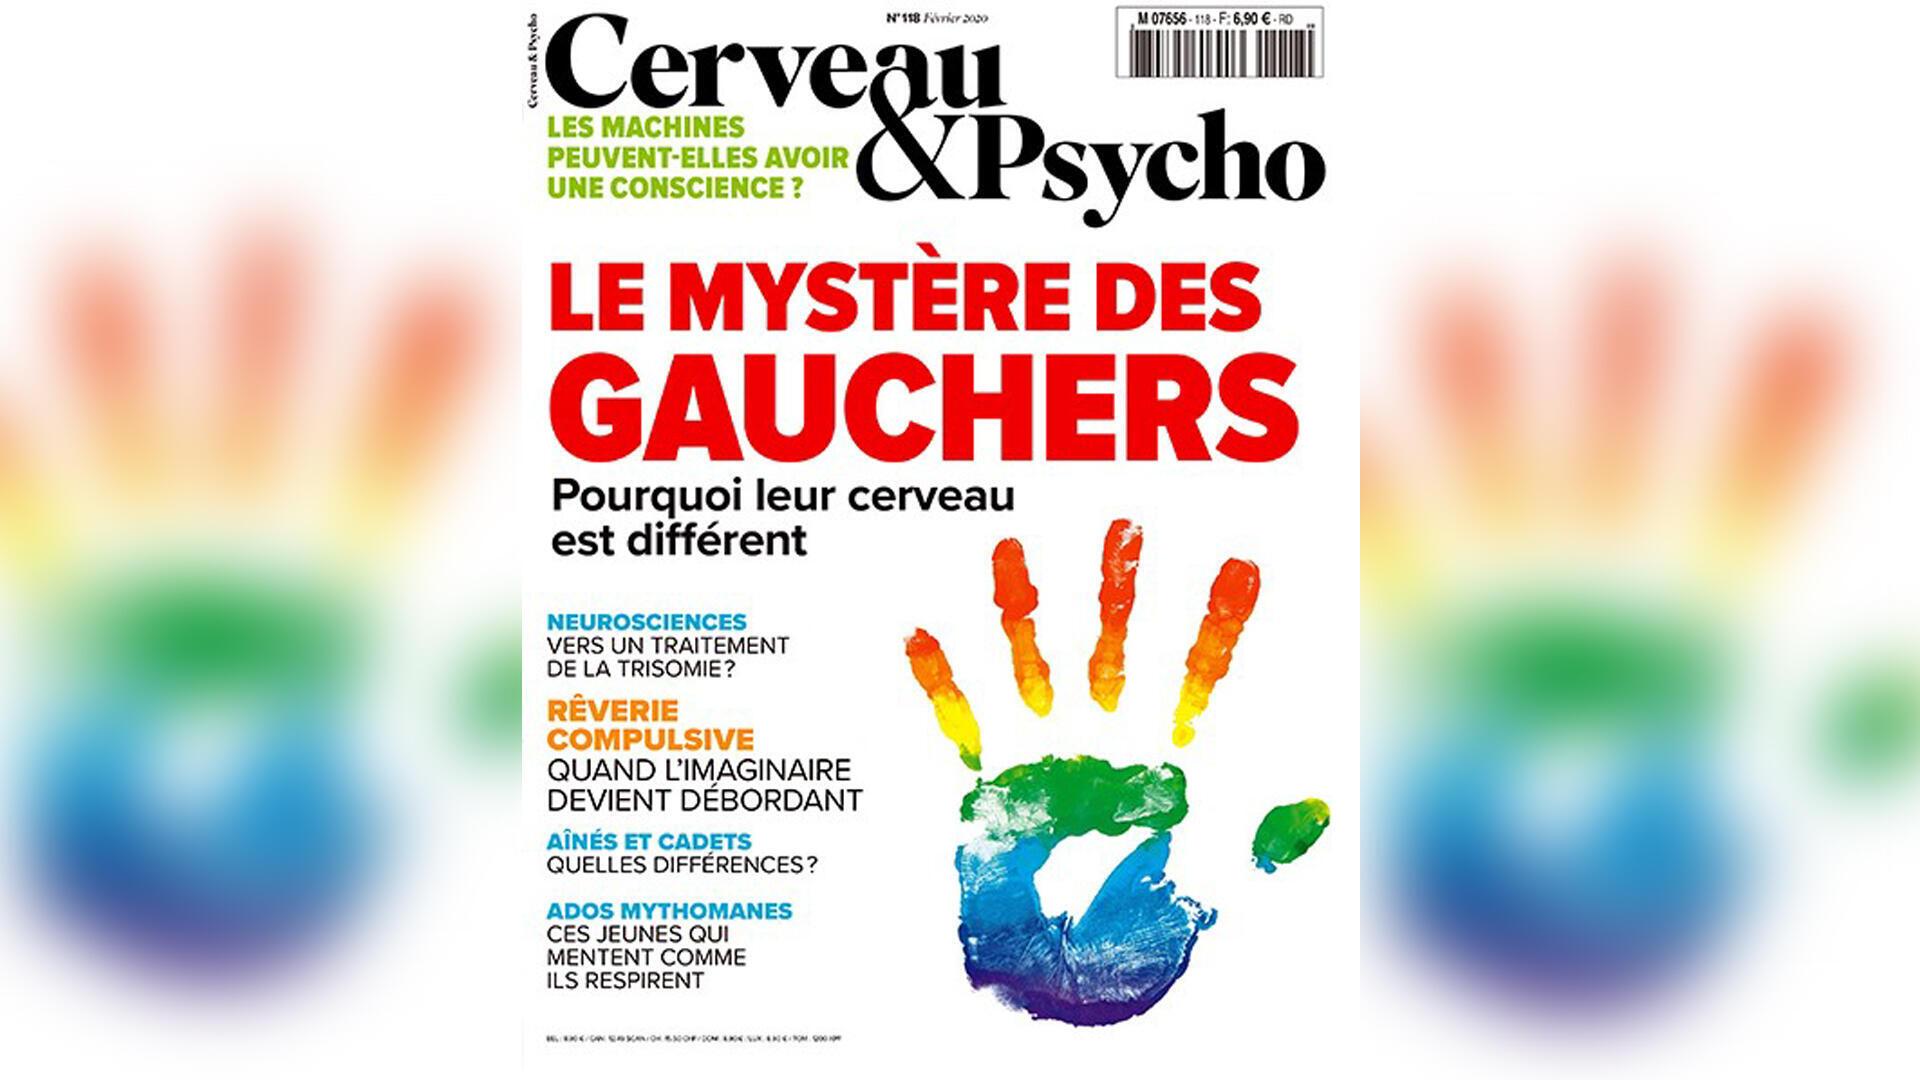 Nanoyankooɓe, holko ganndal e renndo haali fii maɓɓe? Cerveau & Psycho